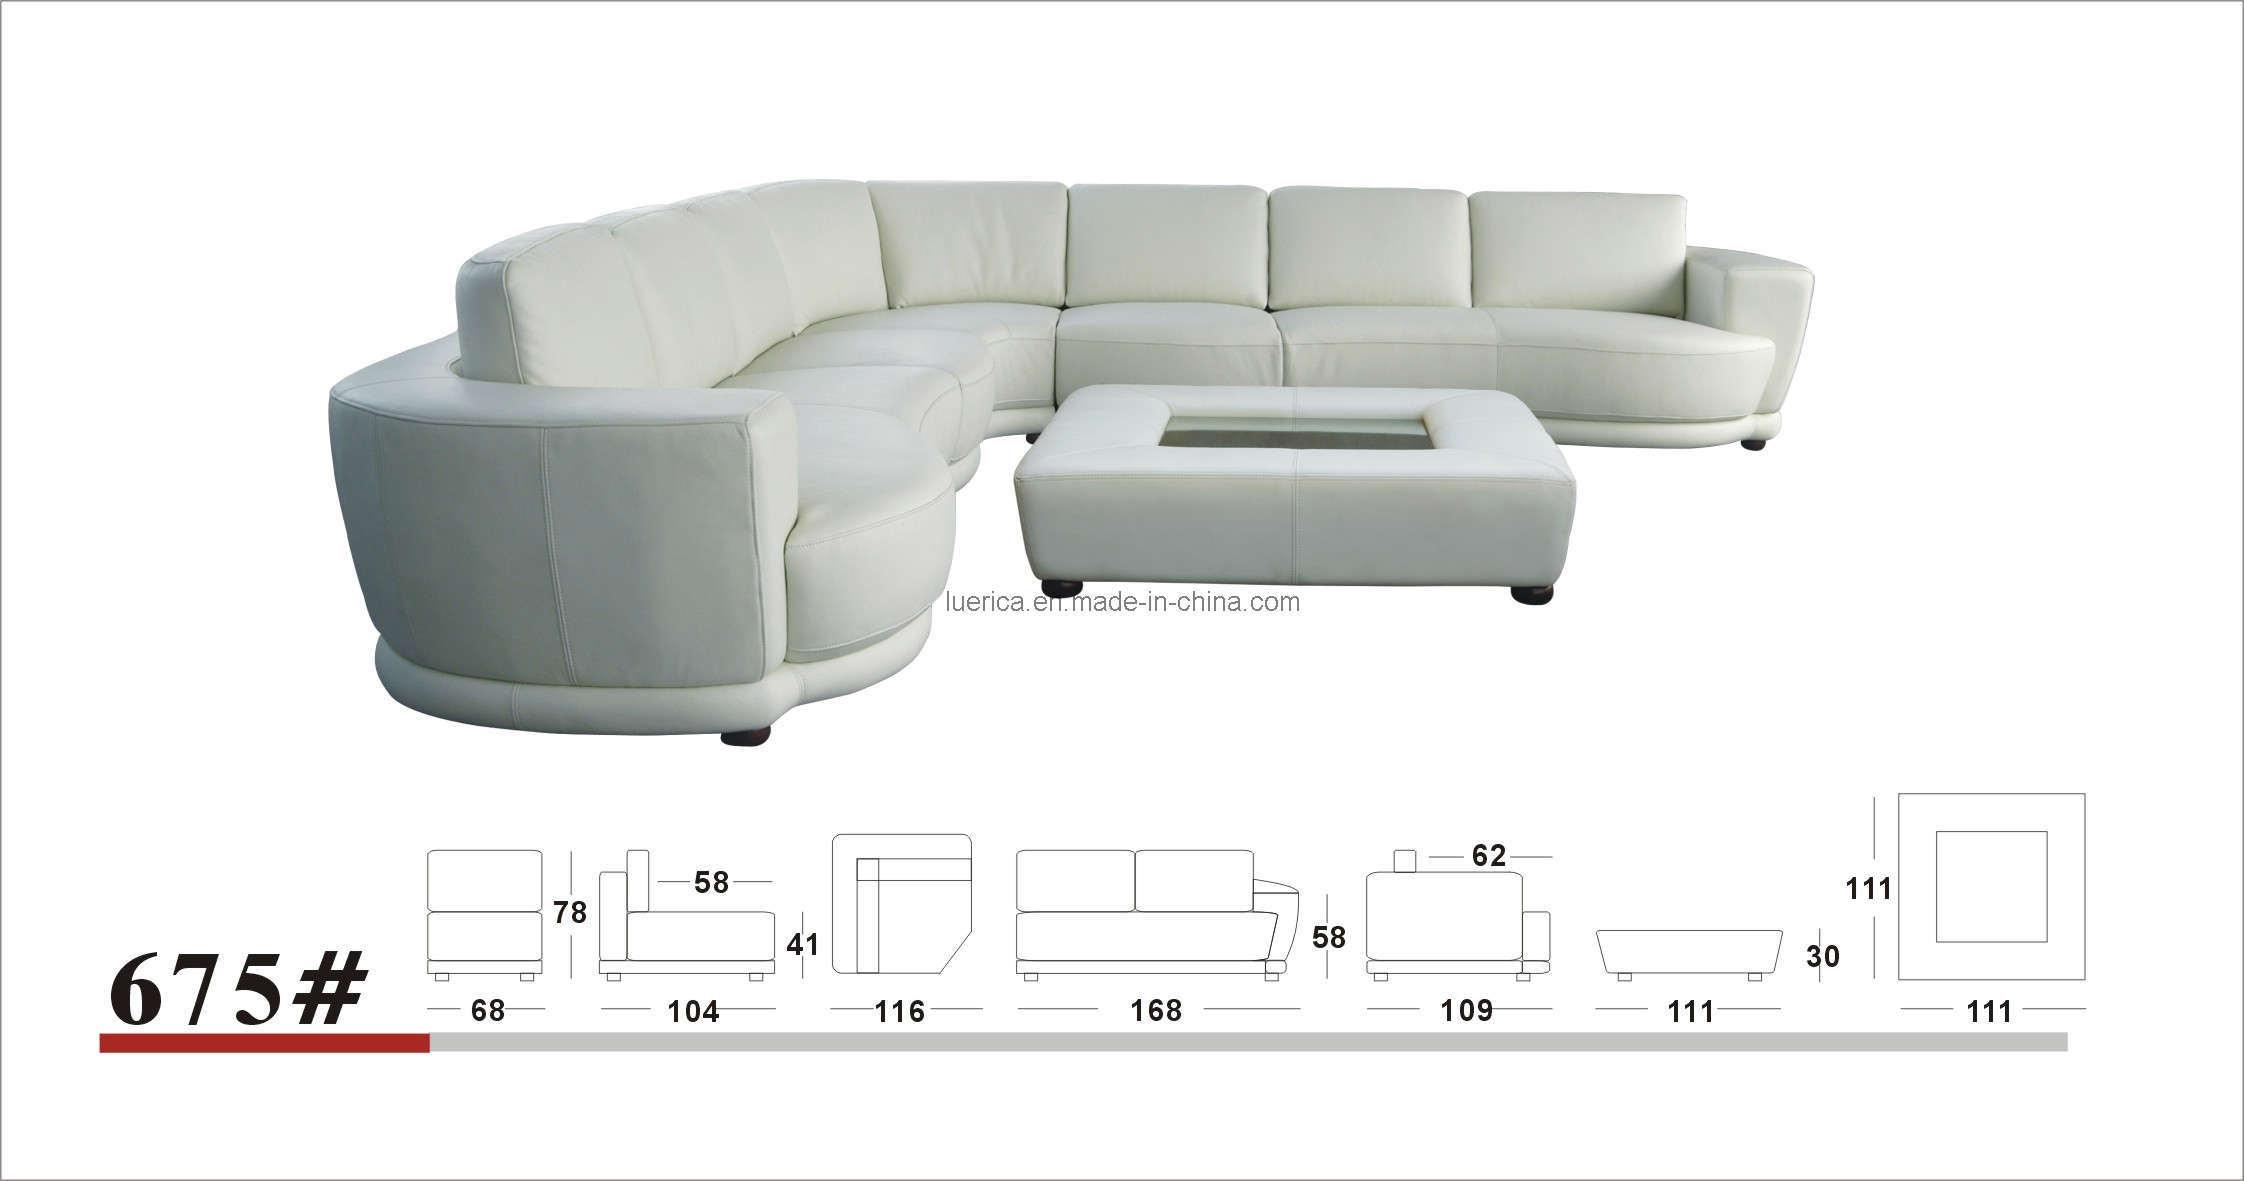 Ikea Manstad Corner Sofa Bed Instructions Eatfreemix